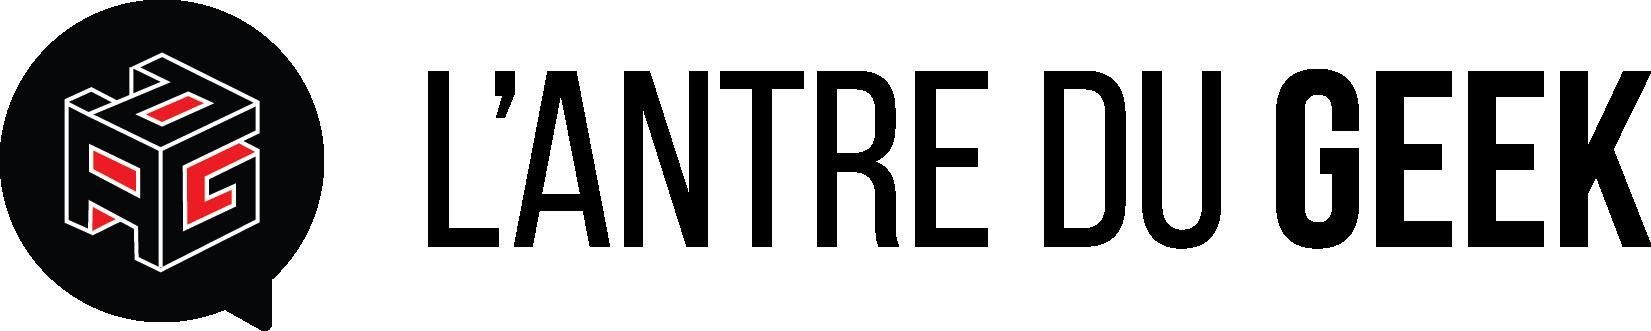 logo texte.png